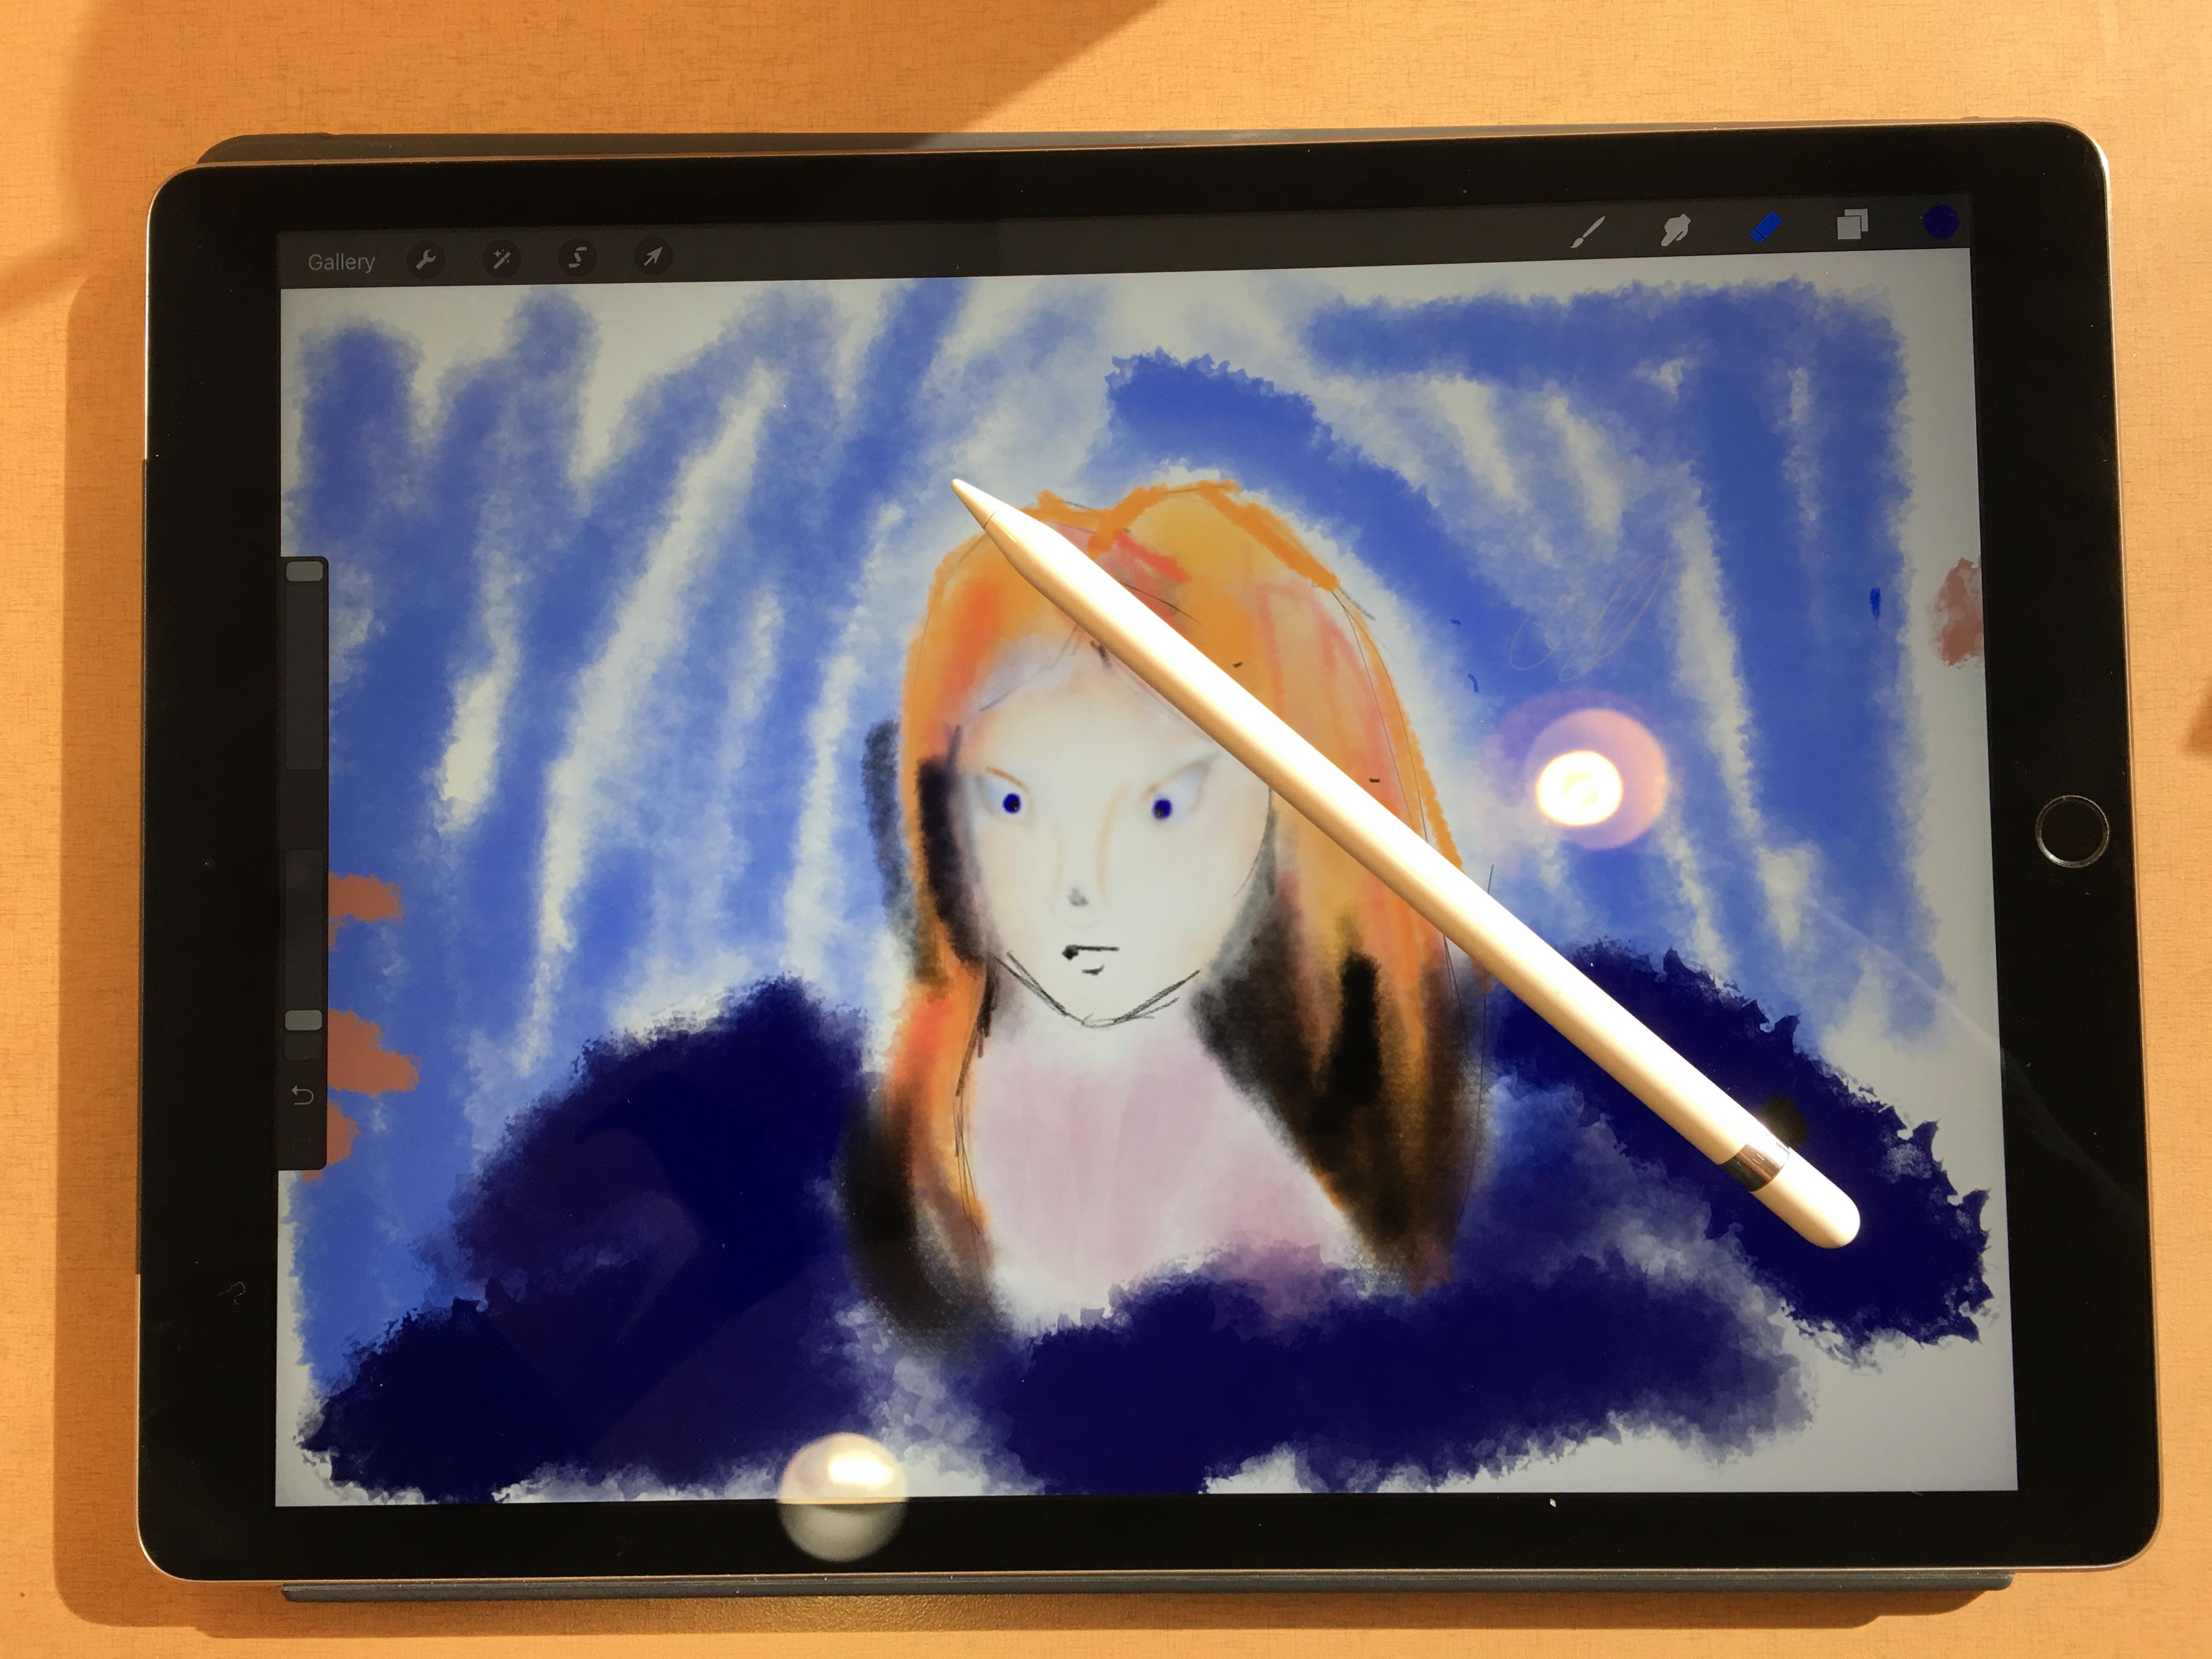 ipad pro and apple pencil with procreate